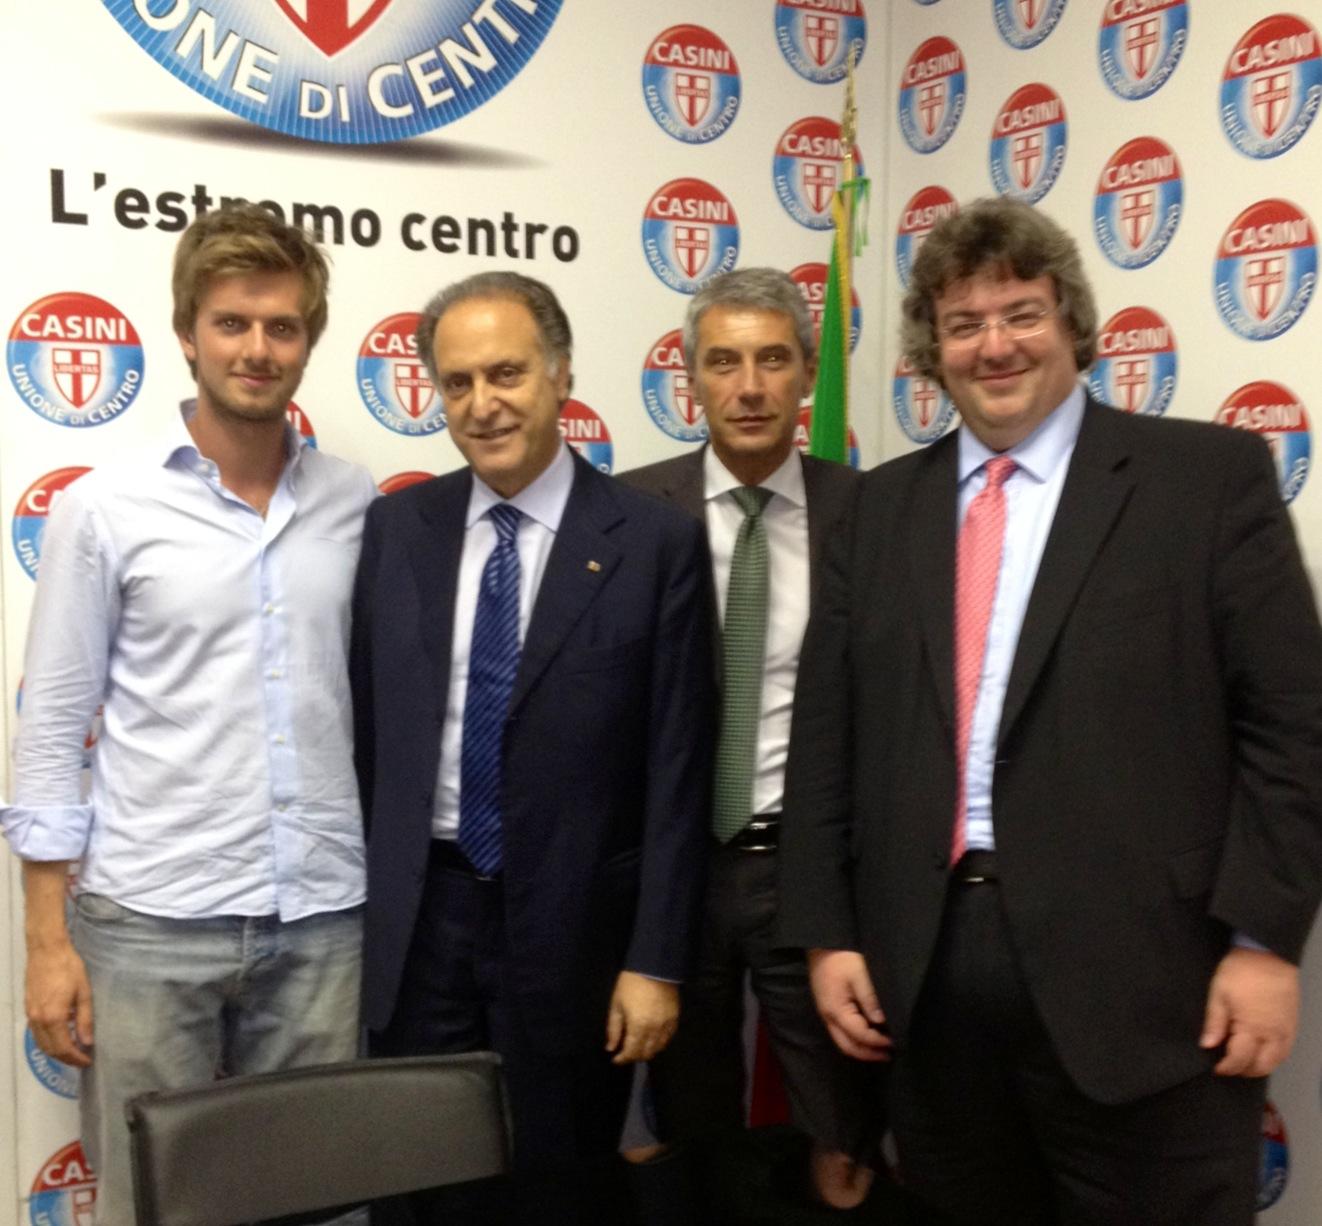 Giovane bergamasco nuovo Coordinatore Regionale Giovani UDC Lombardia